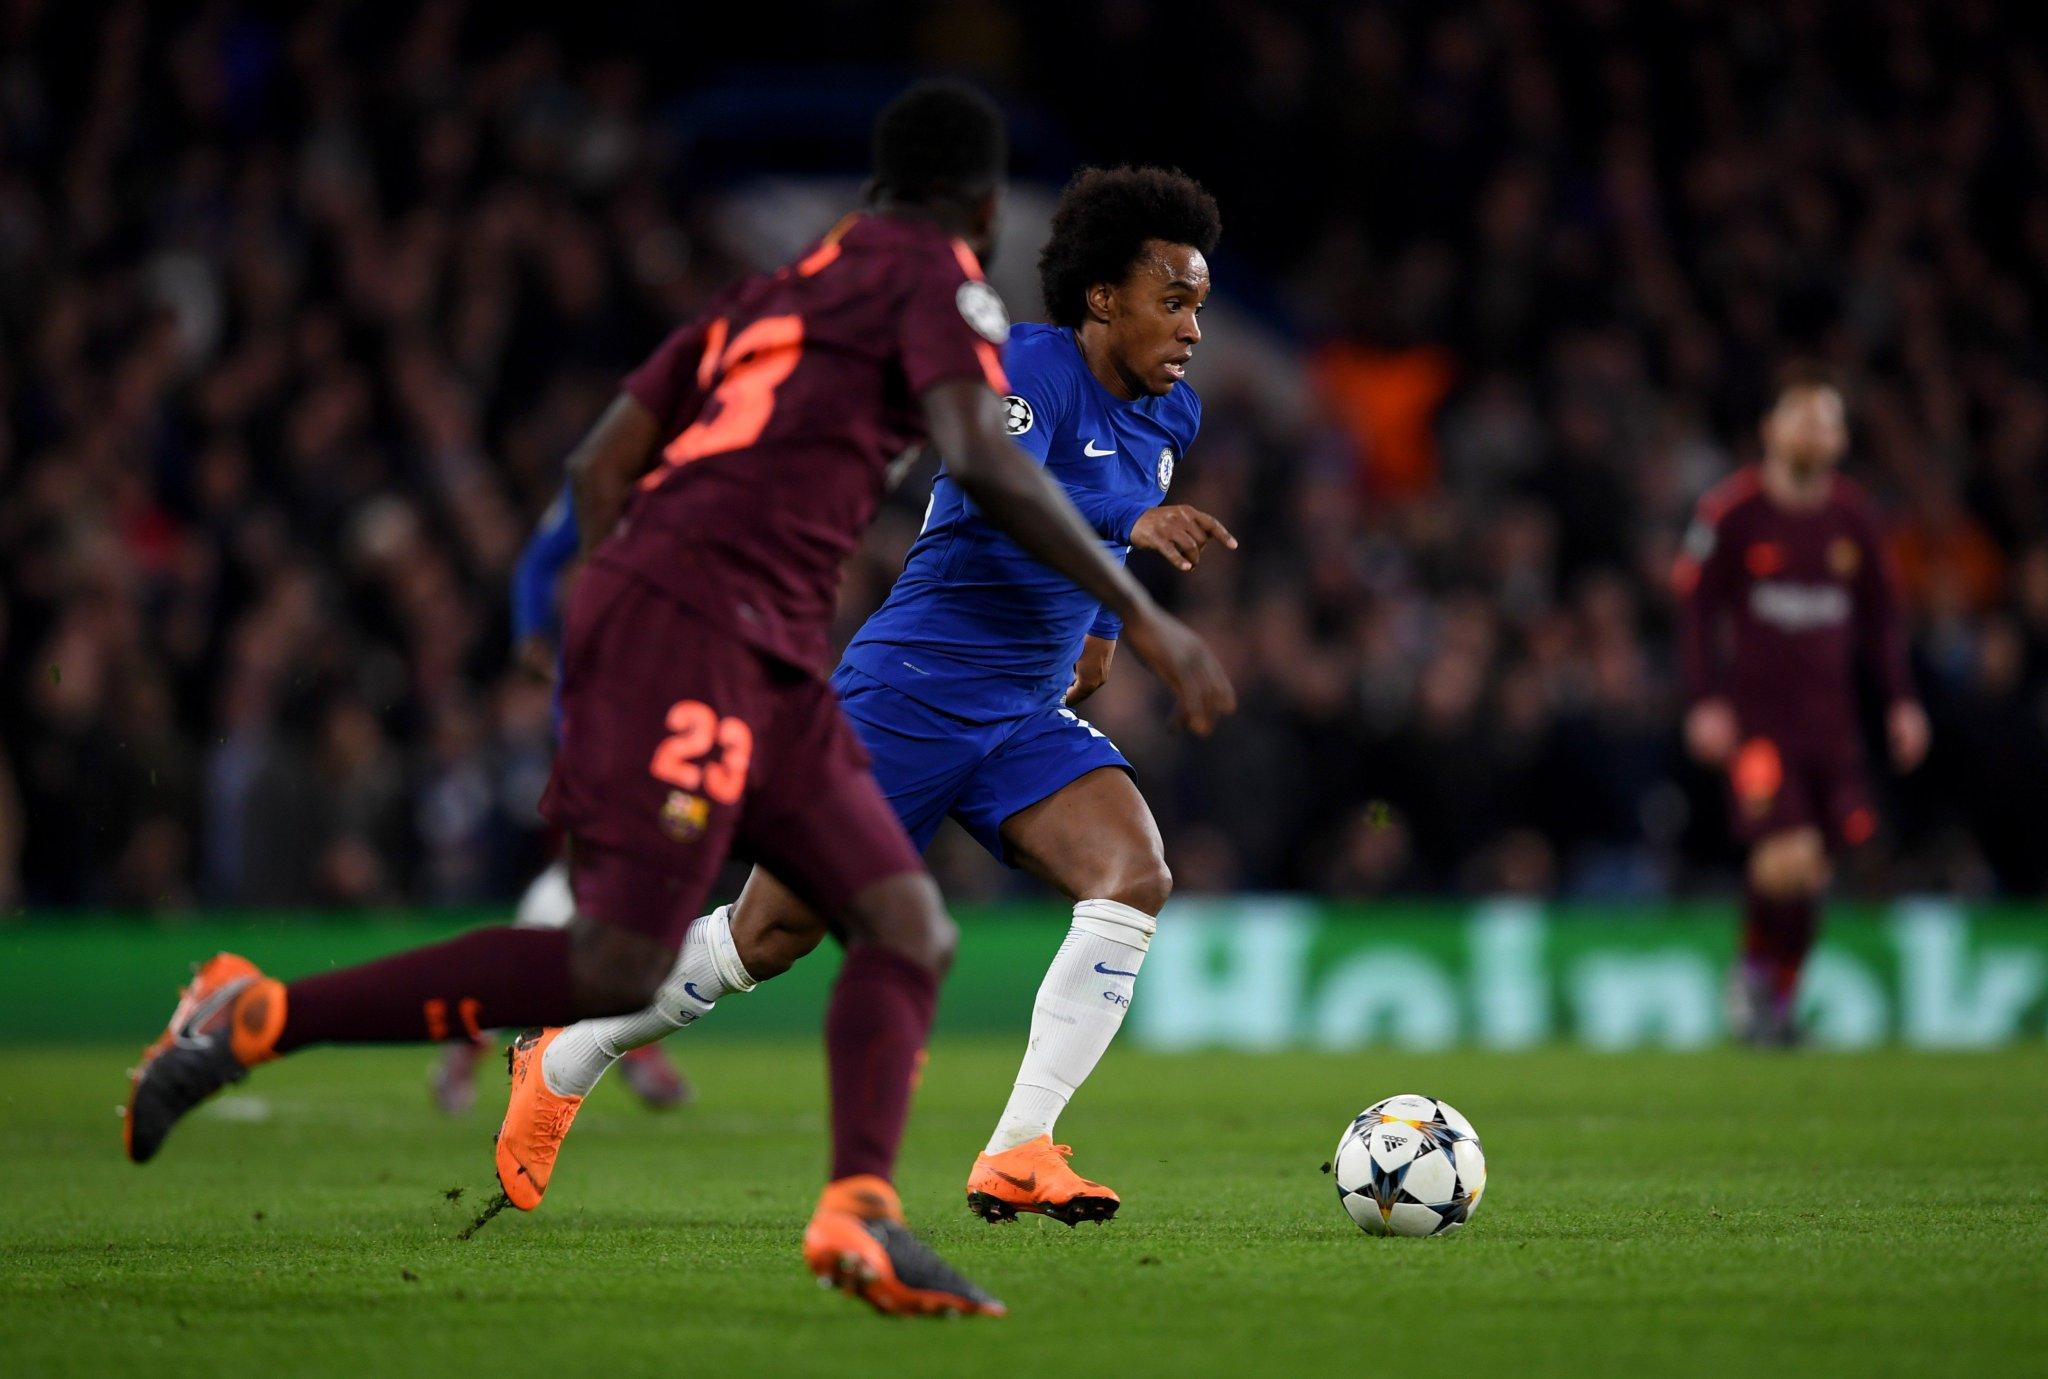 Chelsea FC vs FC Barcelona Highlights & Goals Video - Champions League - 20 February 2108